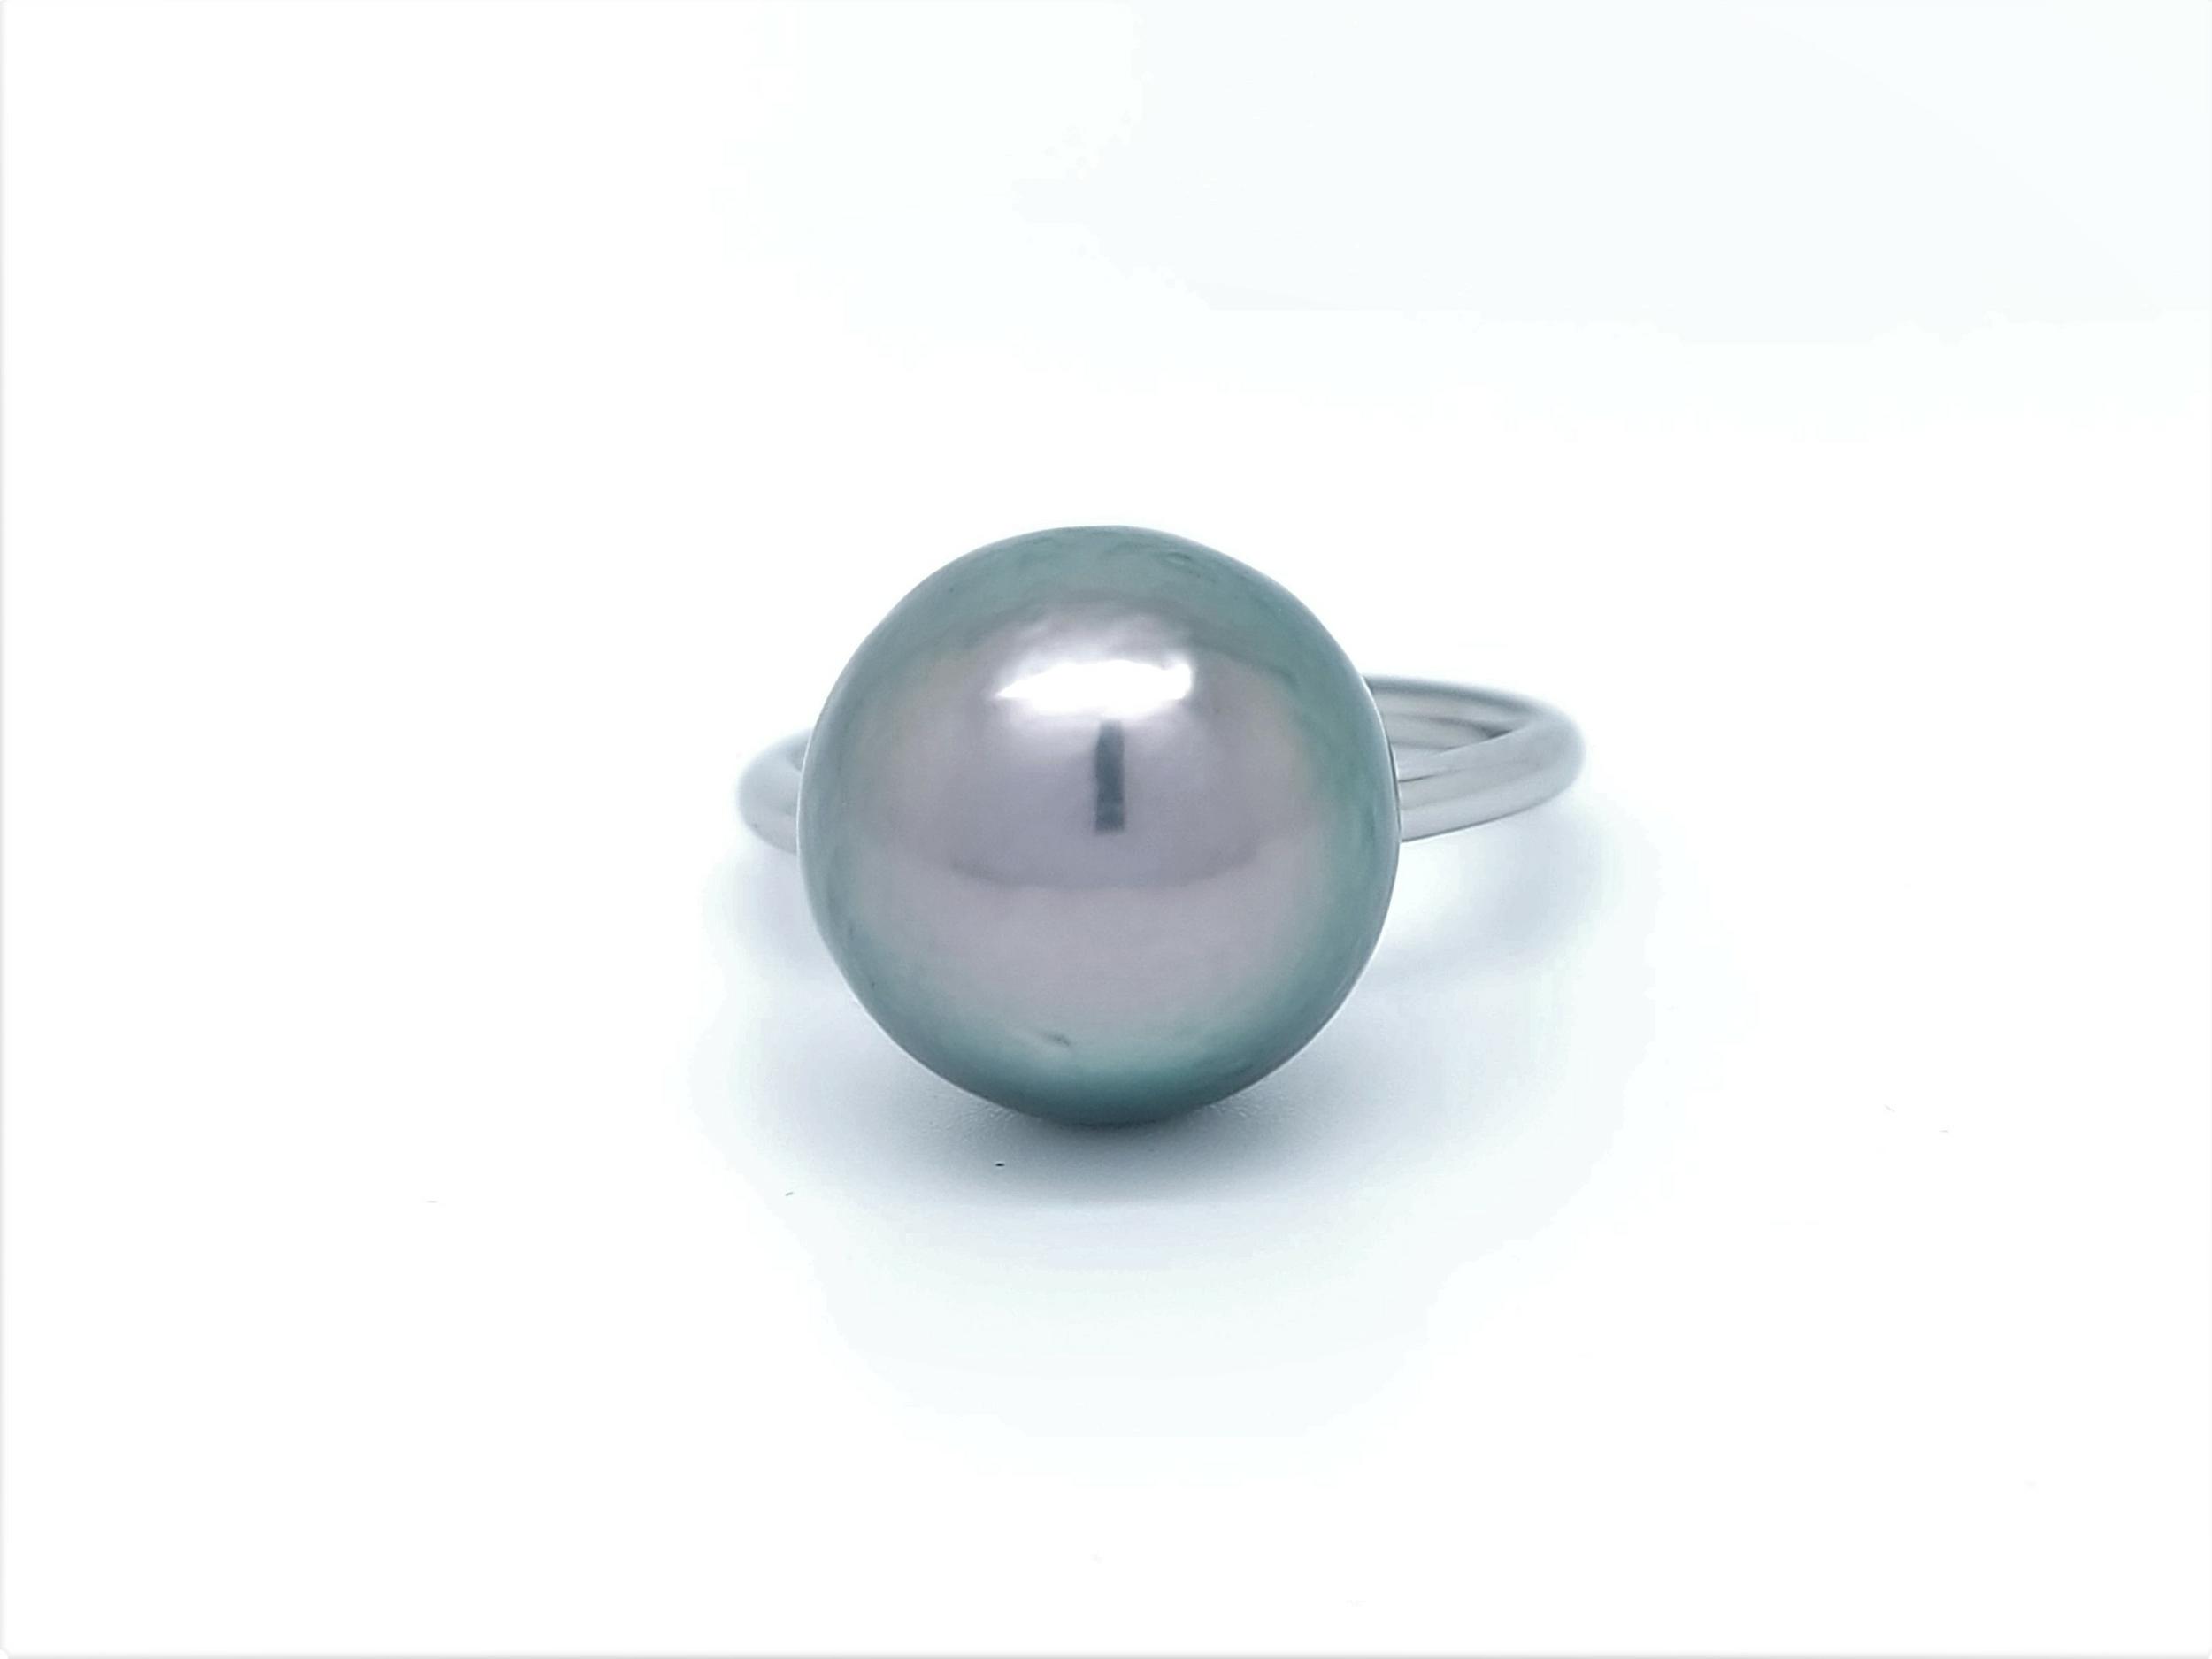 Bague essentiel en acier 1 perle de Tahiti de 12 mm de couleur queue-de-paon vert